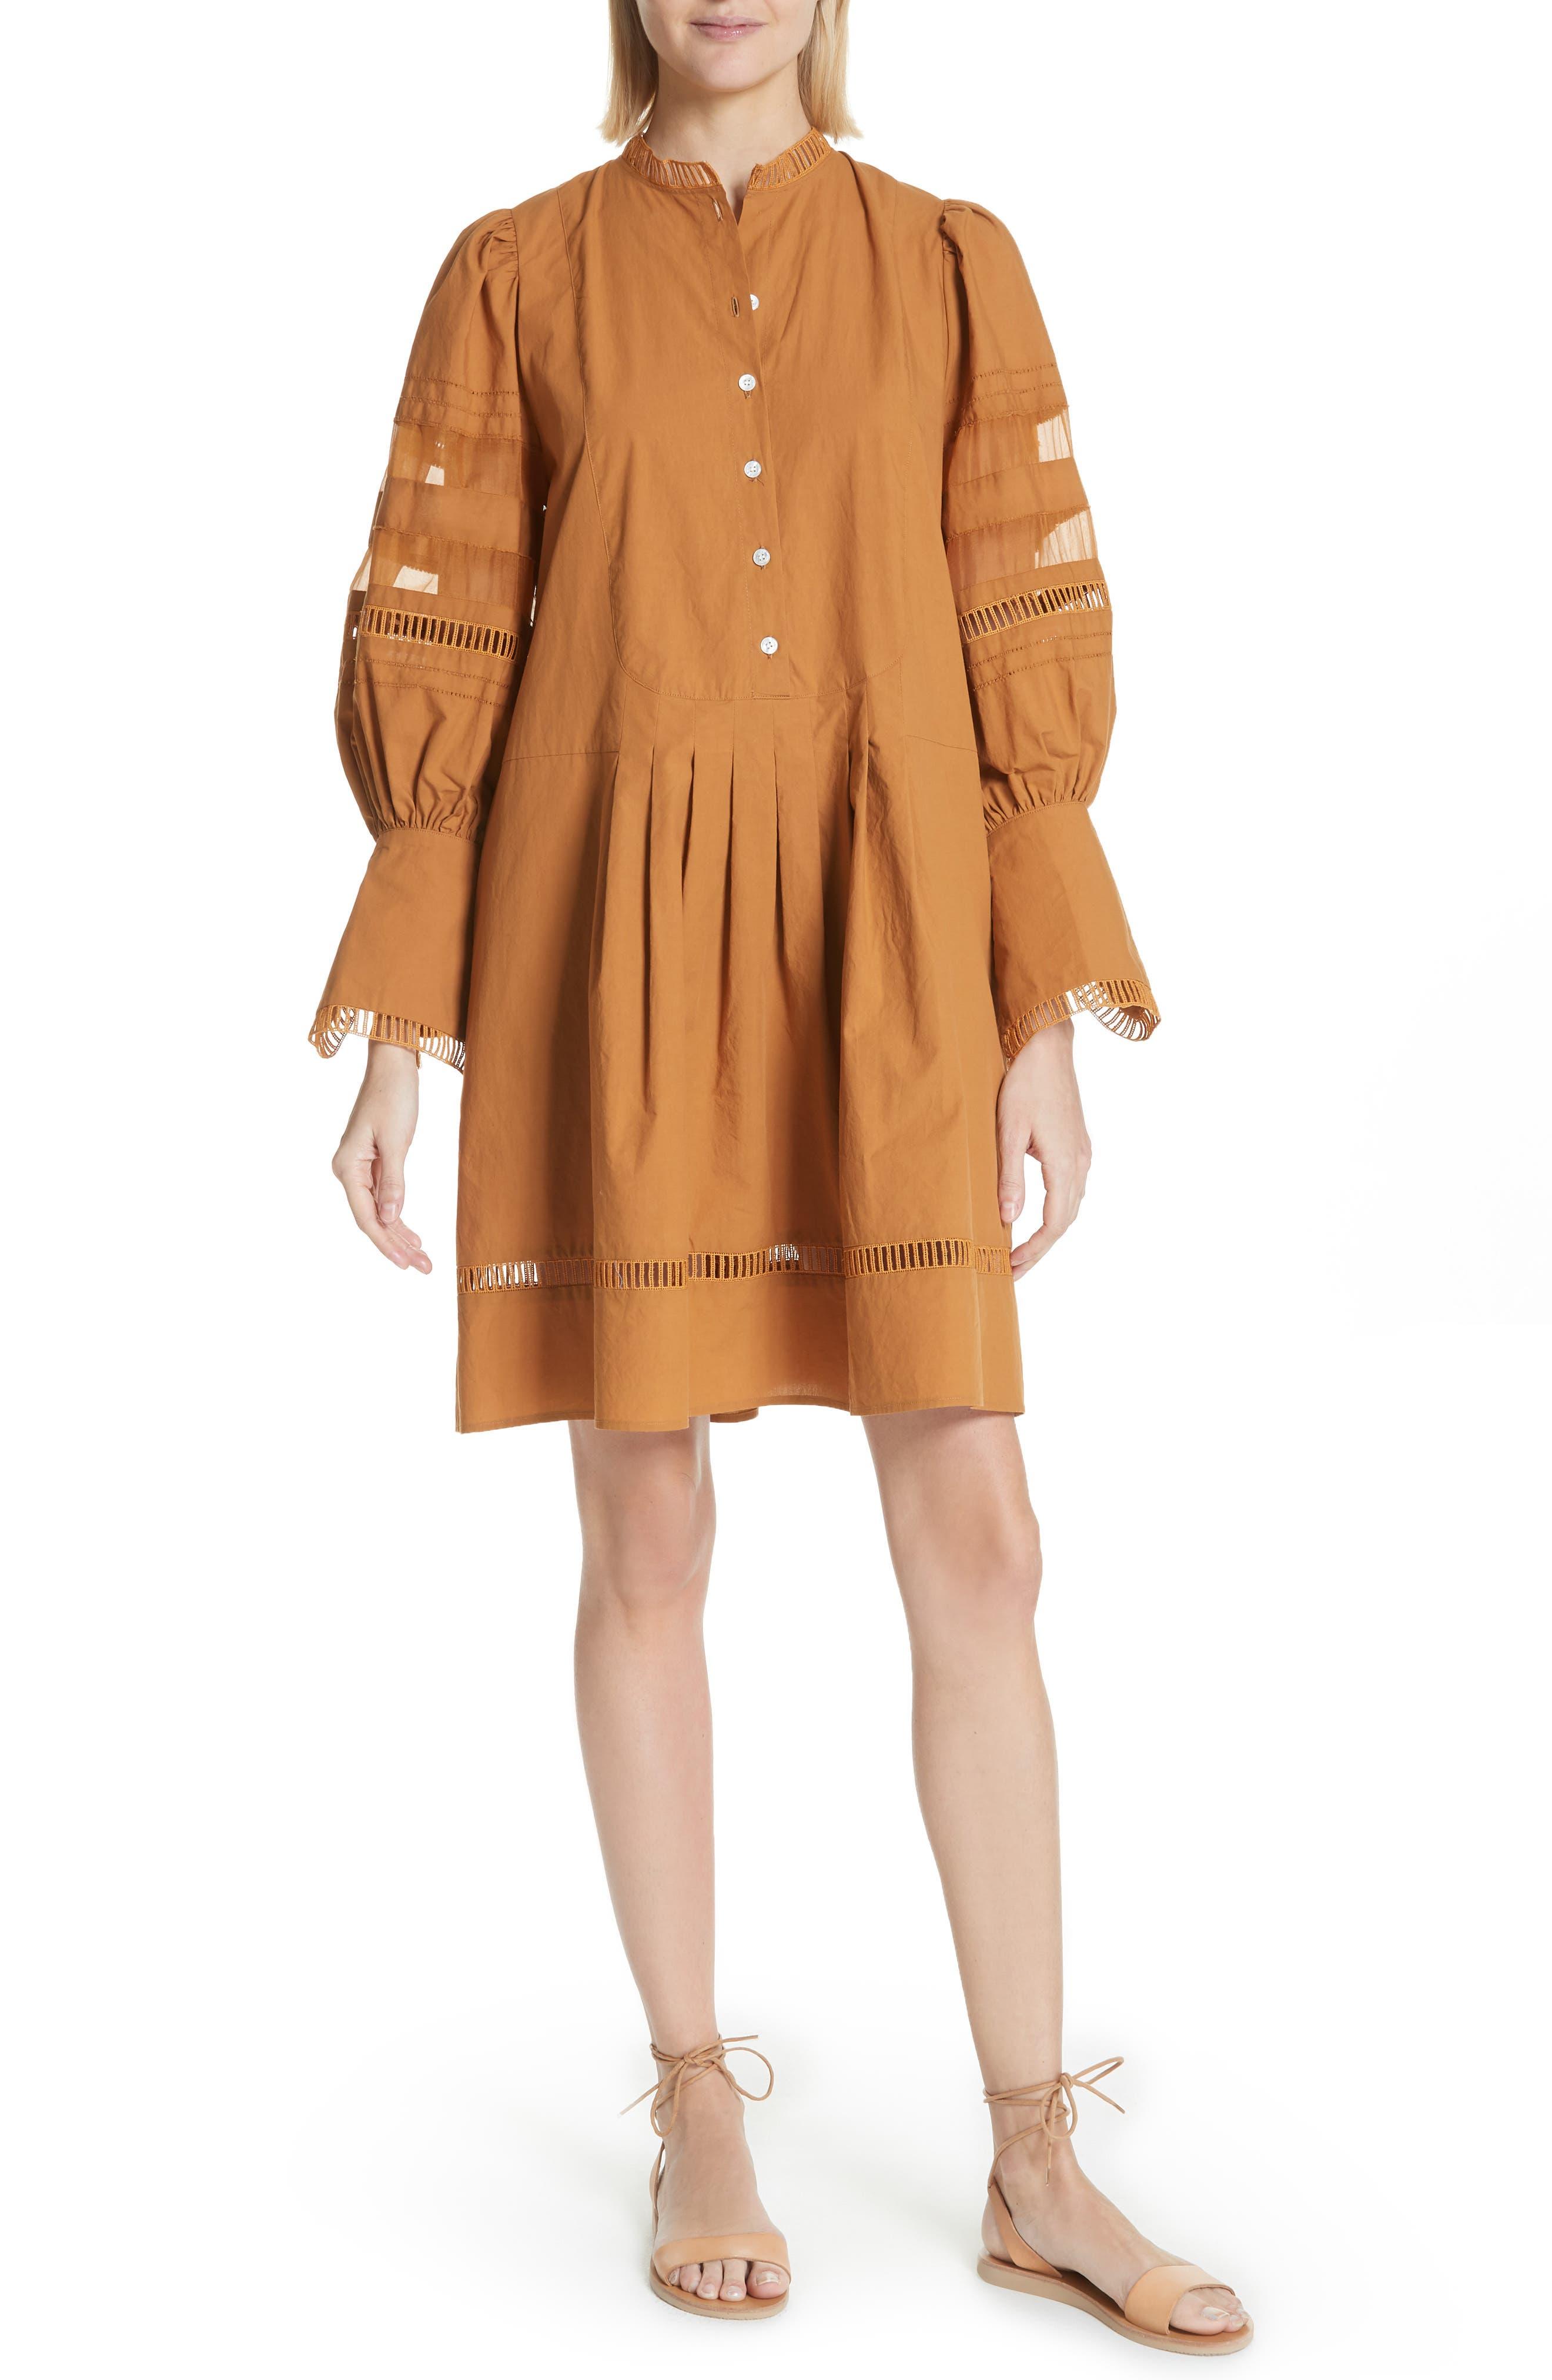 Capri Ladder Stitch Trim Dress,                             Main thumbnail 1, color,                             205